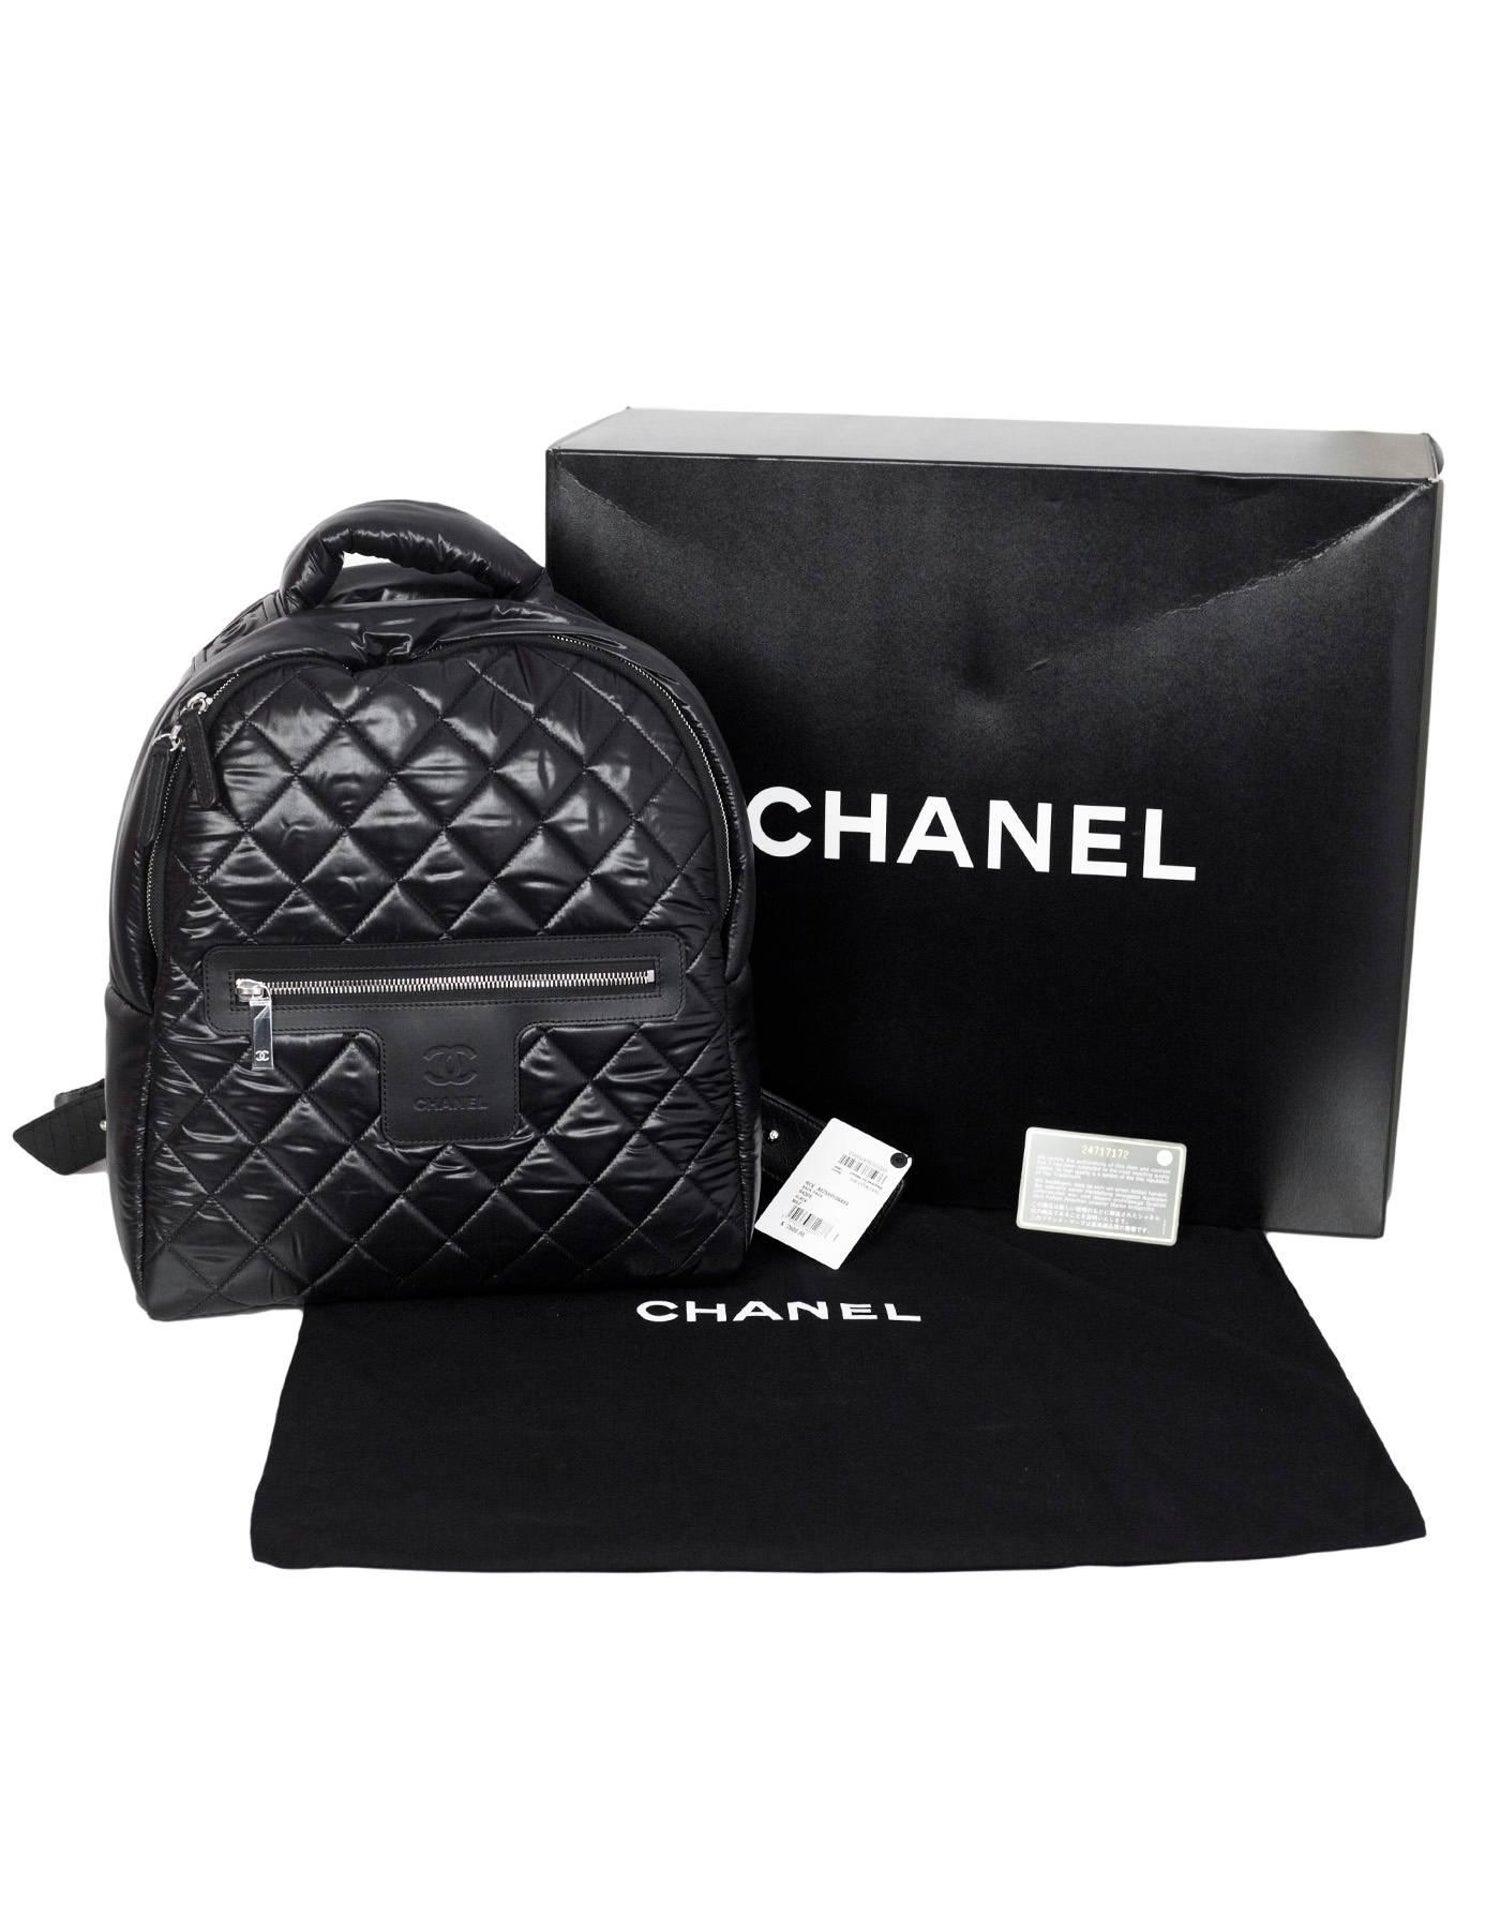 defe6f8088b Chanel Backpack Buy Online- Fenix Toulouse Handball